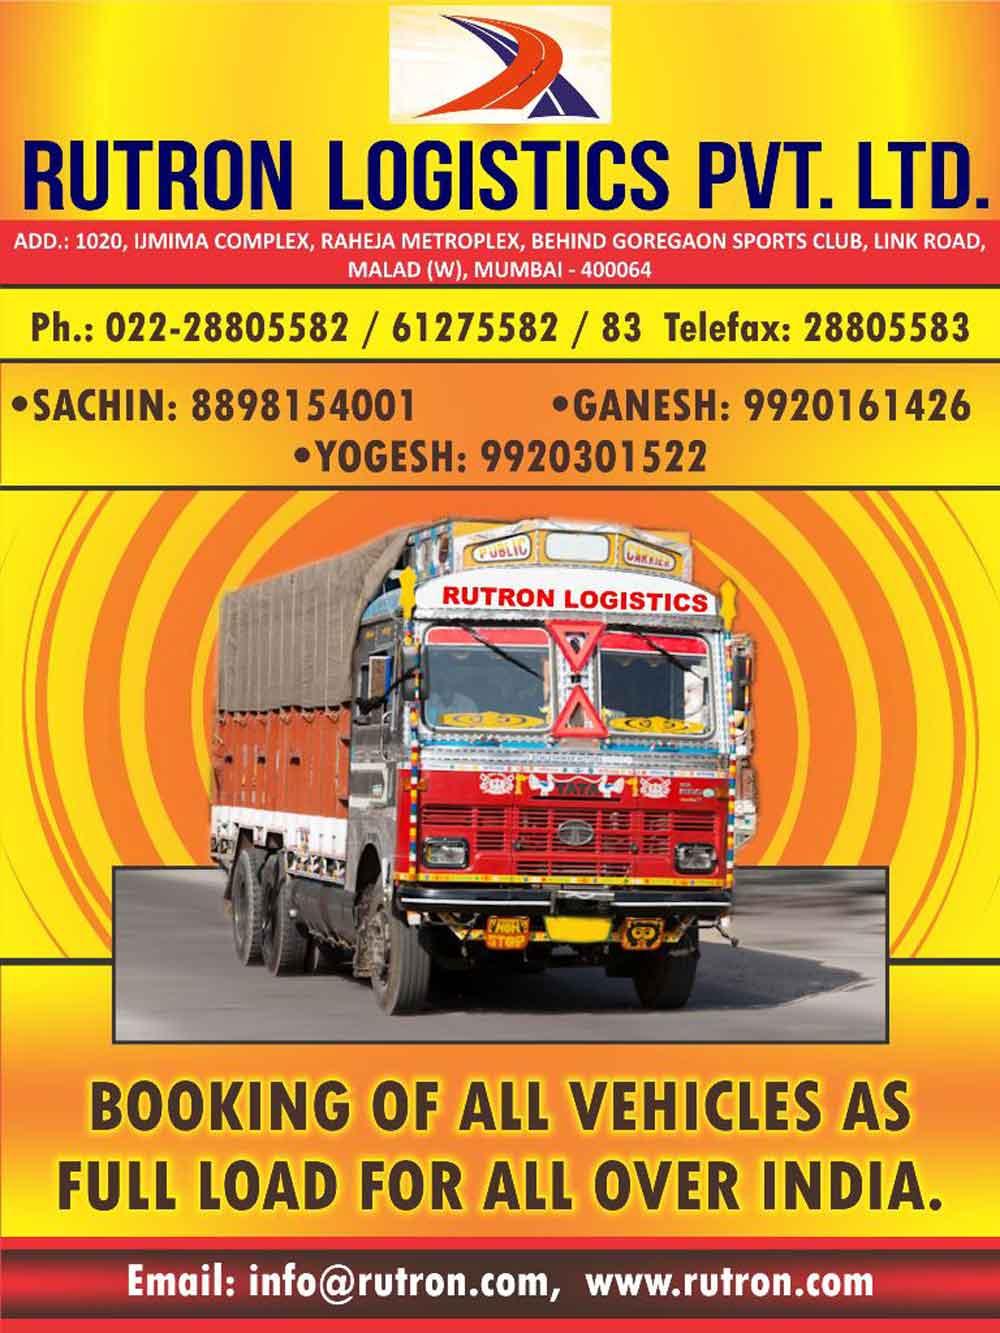 Rutron Logistics